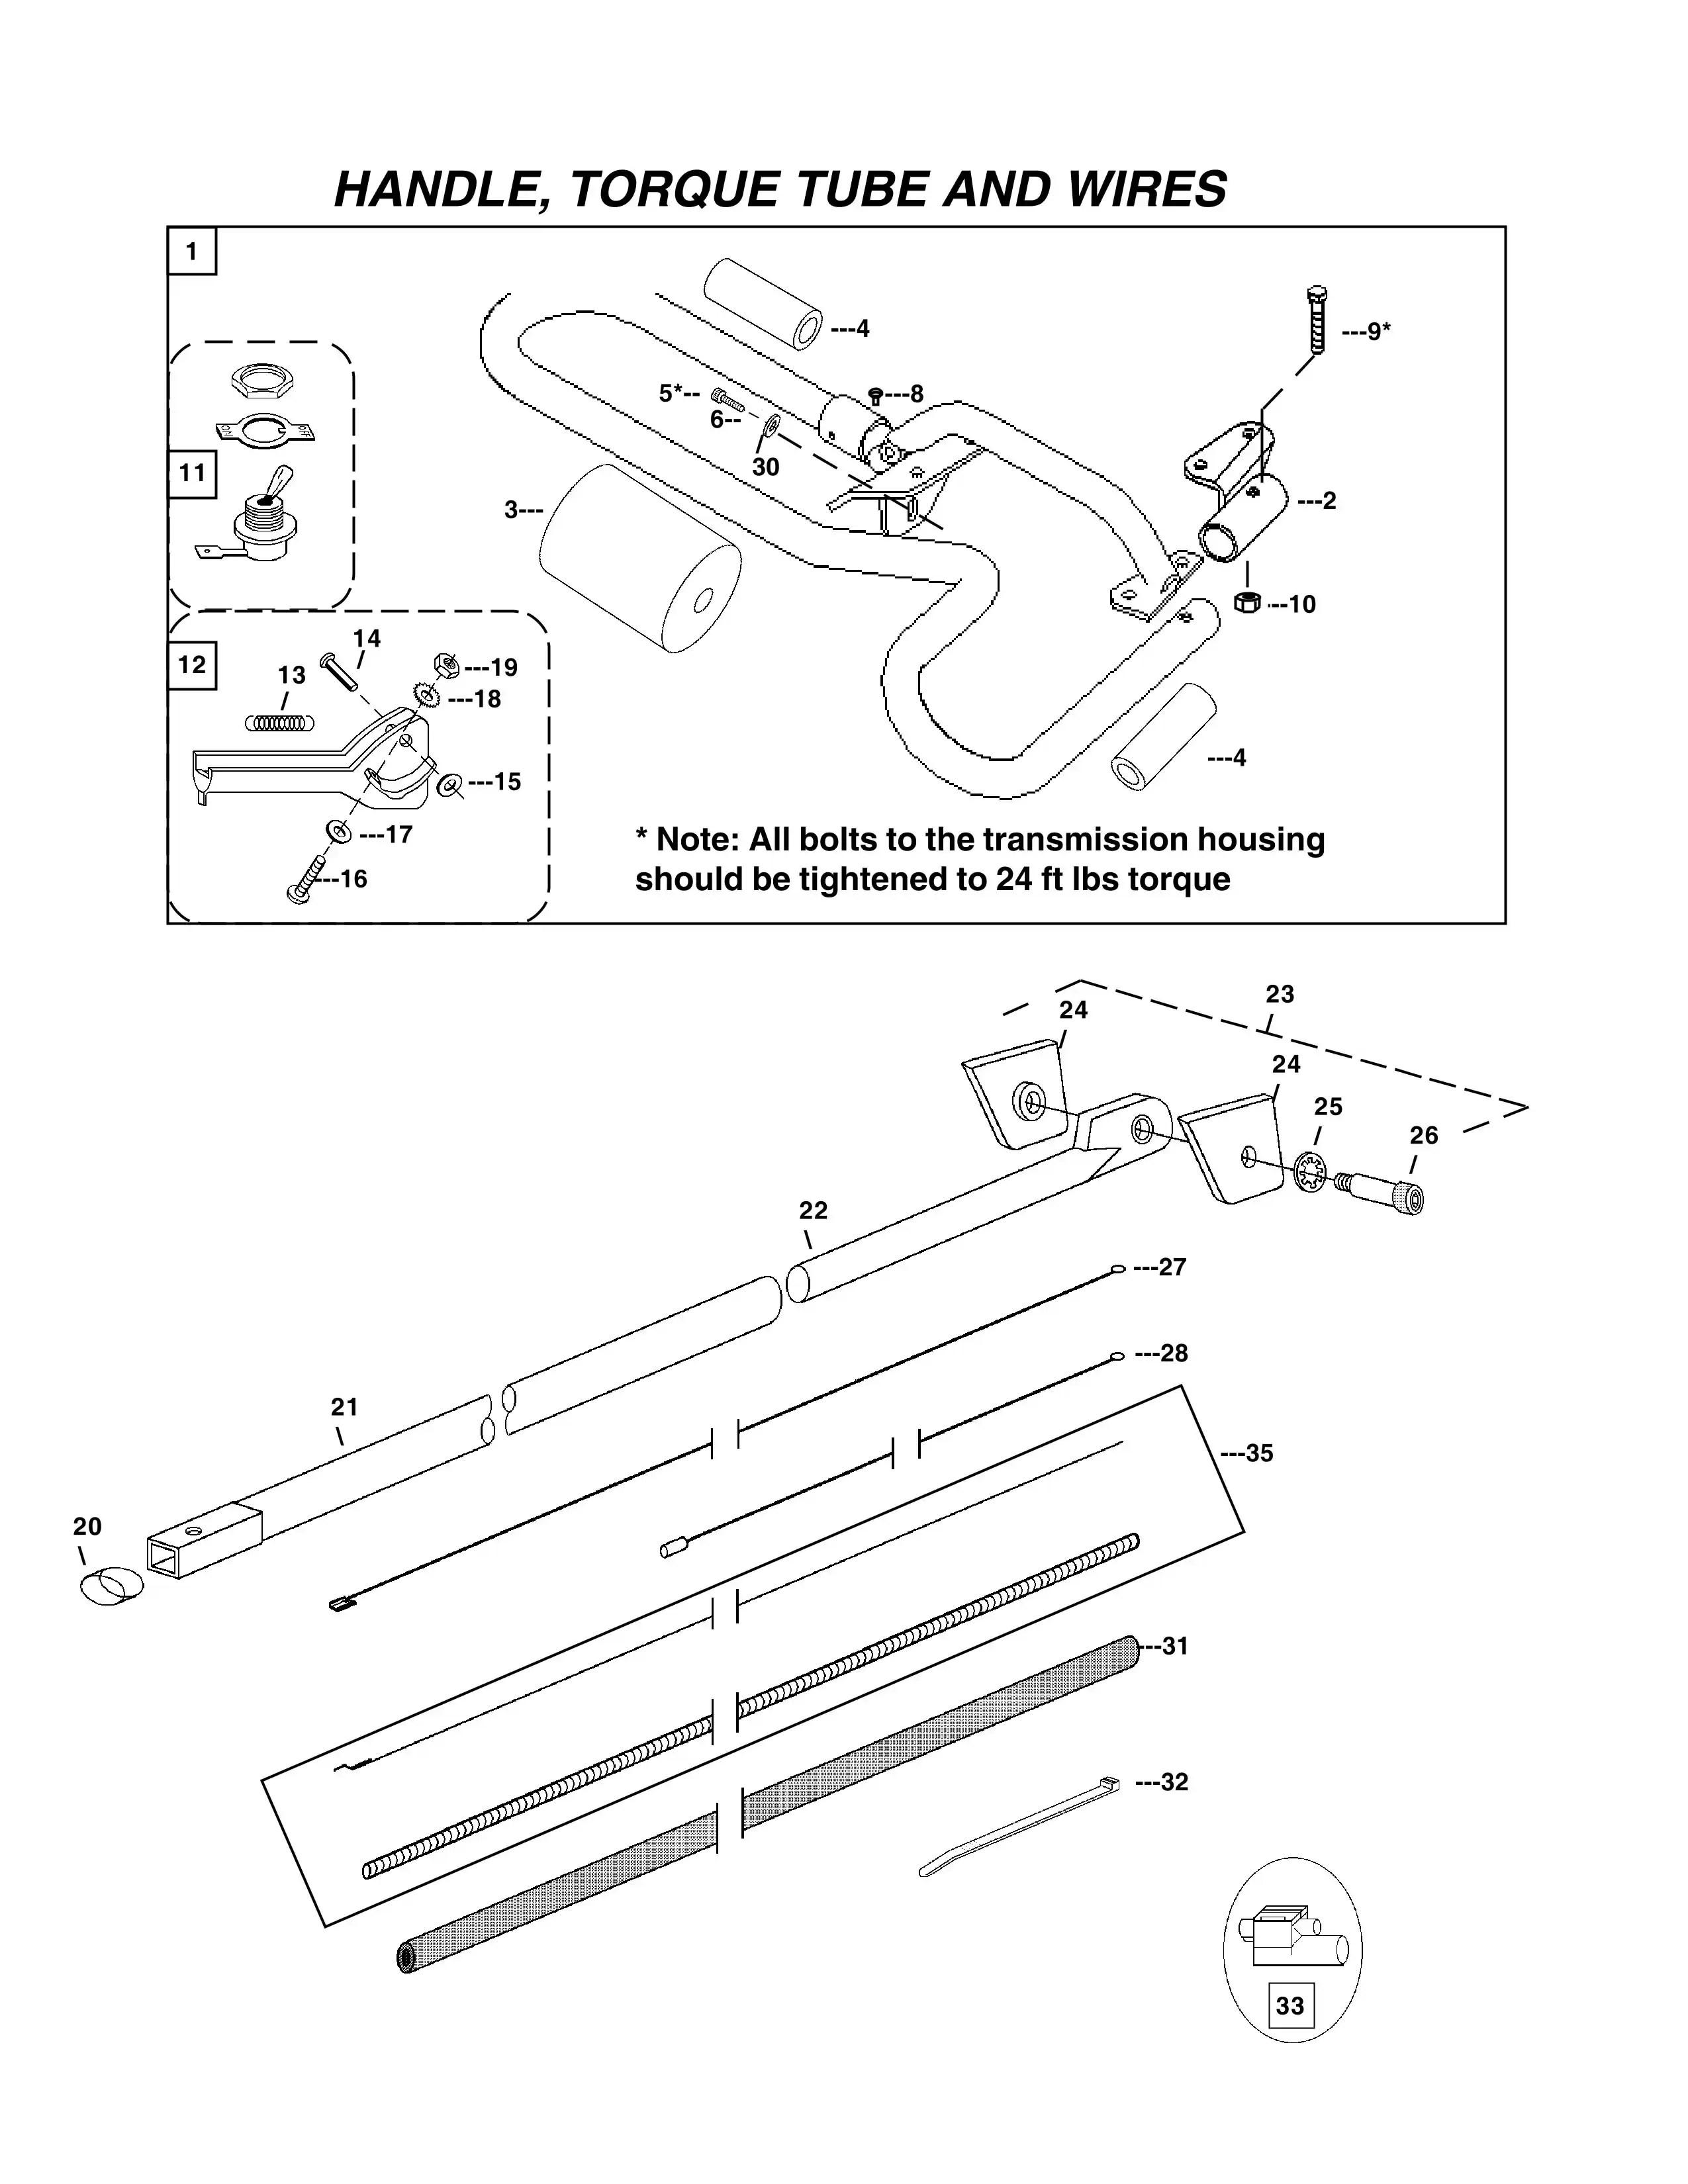 Handle Torque Tube Amp Wires